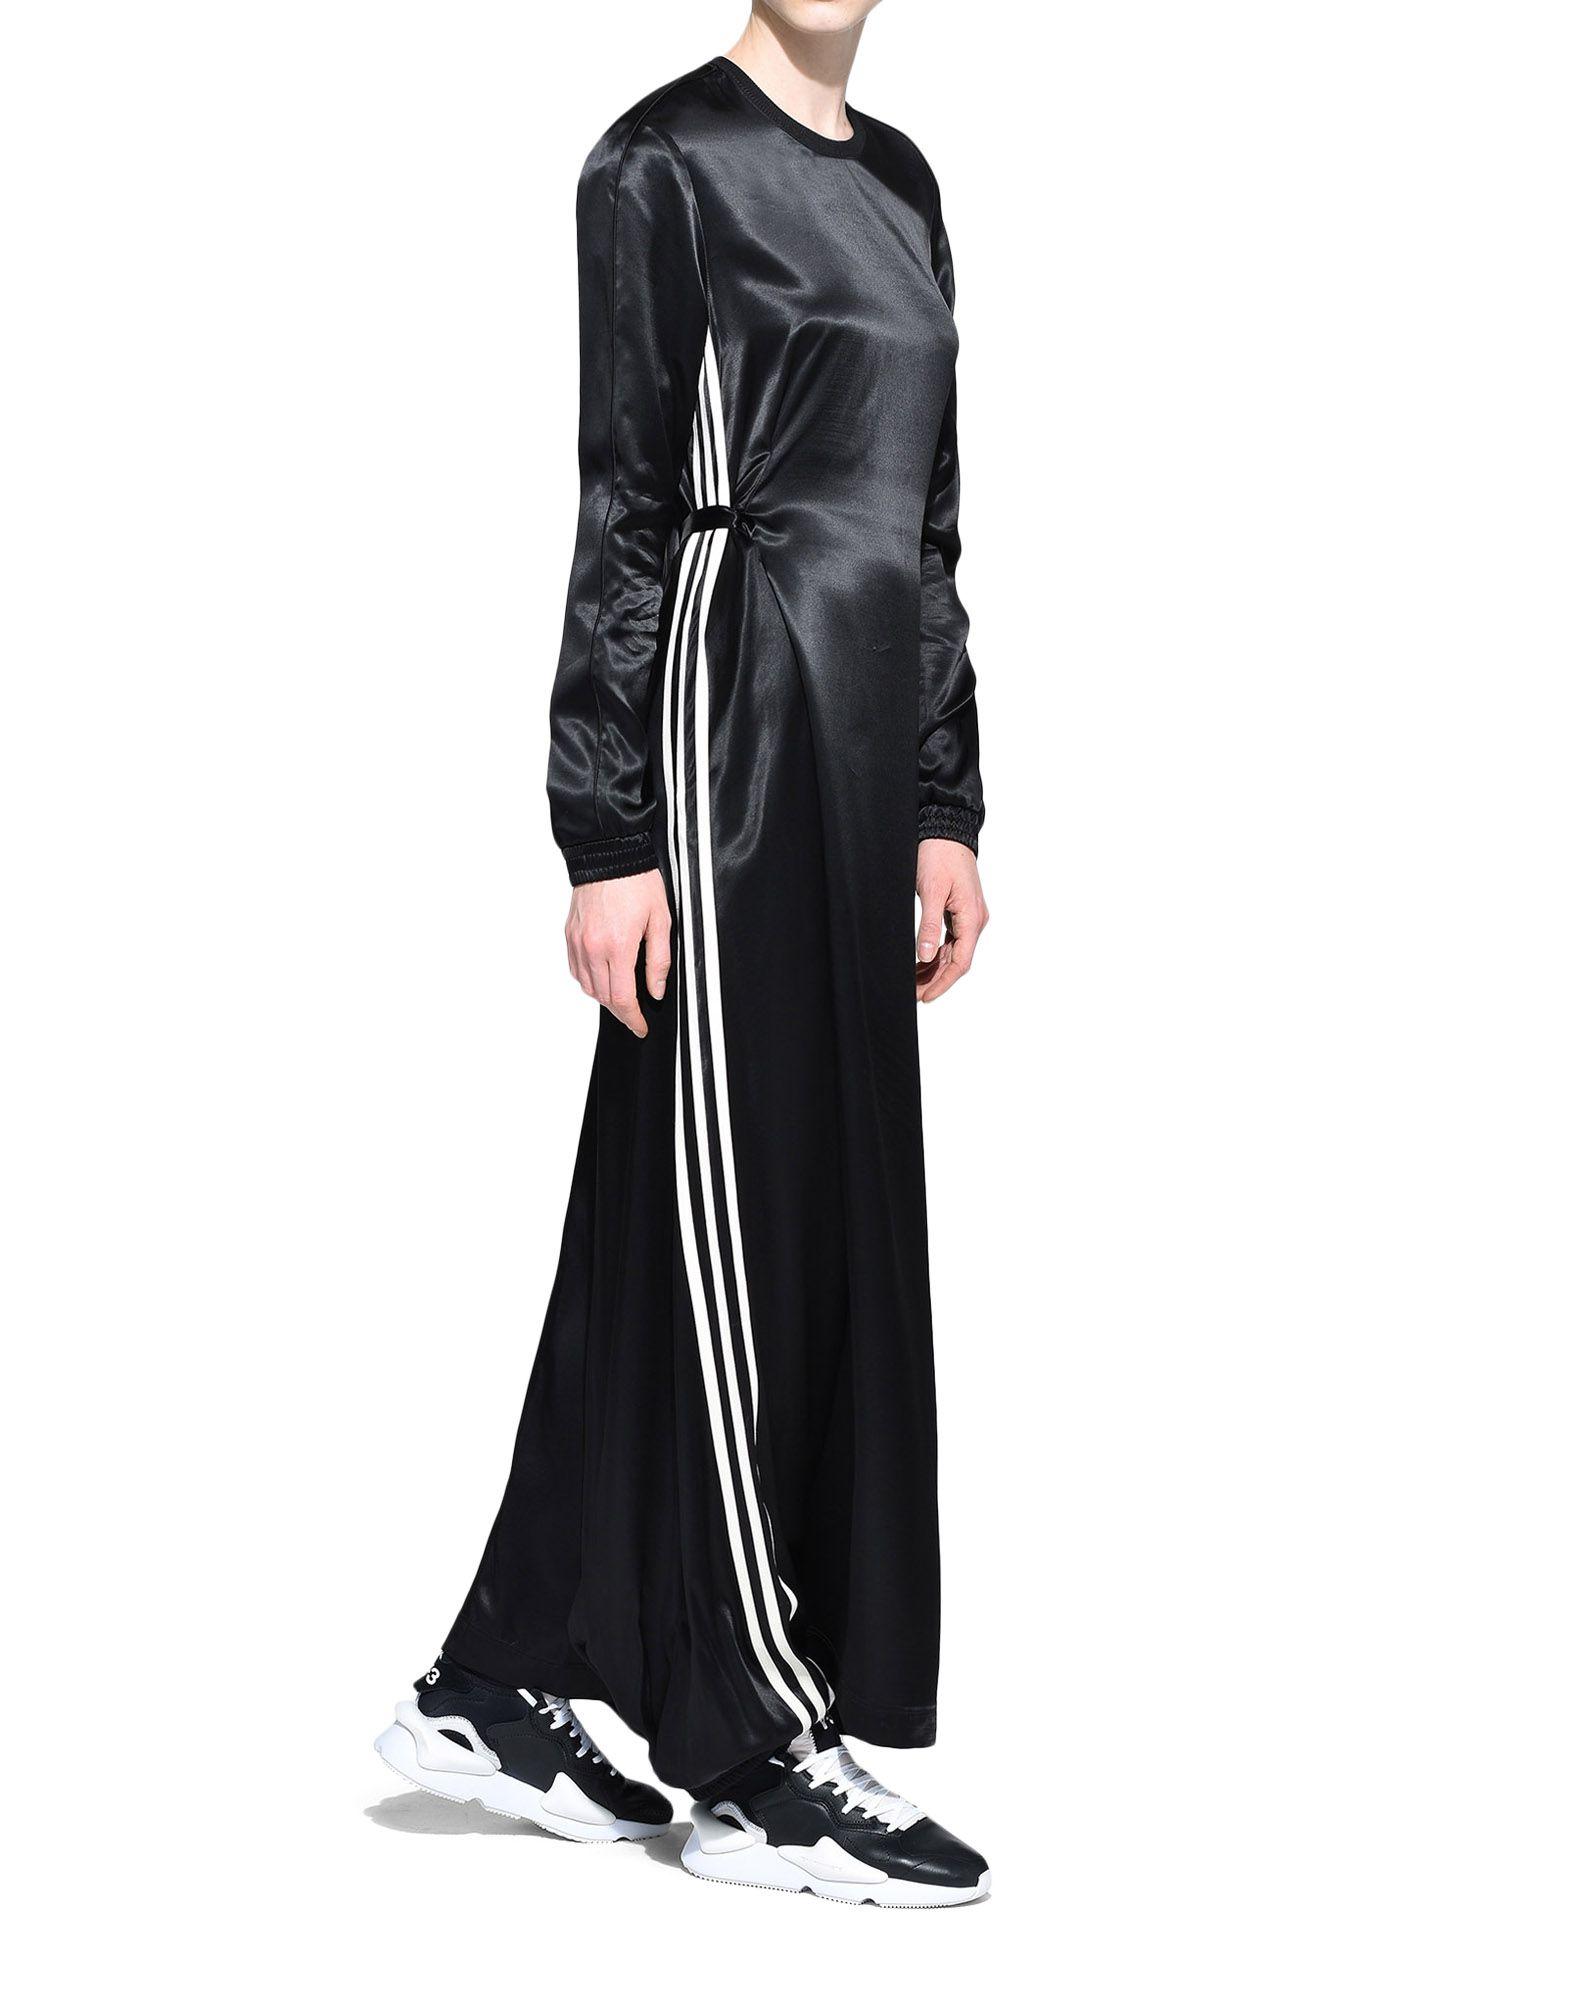 Y-3 Y-3 3-Stripes Lux Track Dress Длинное платье Для Женщин a